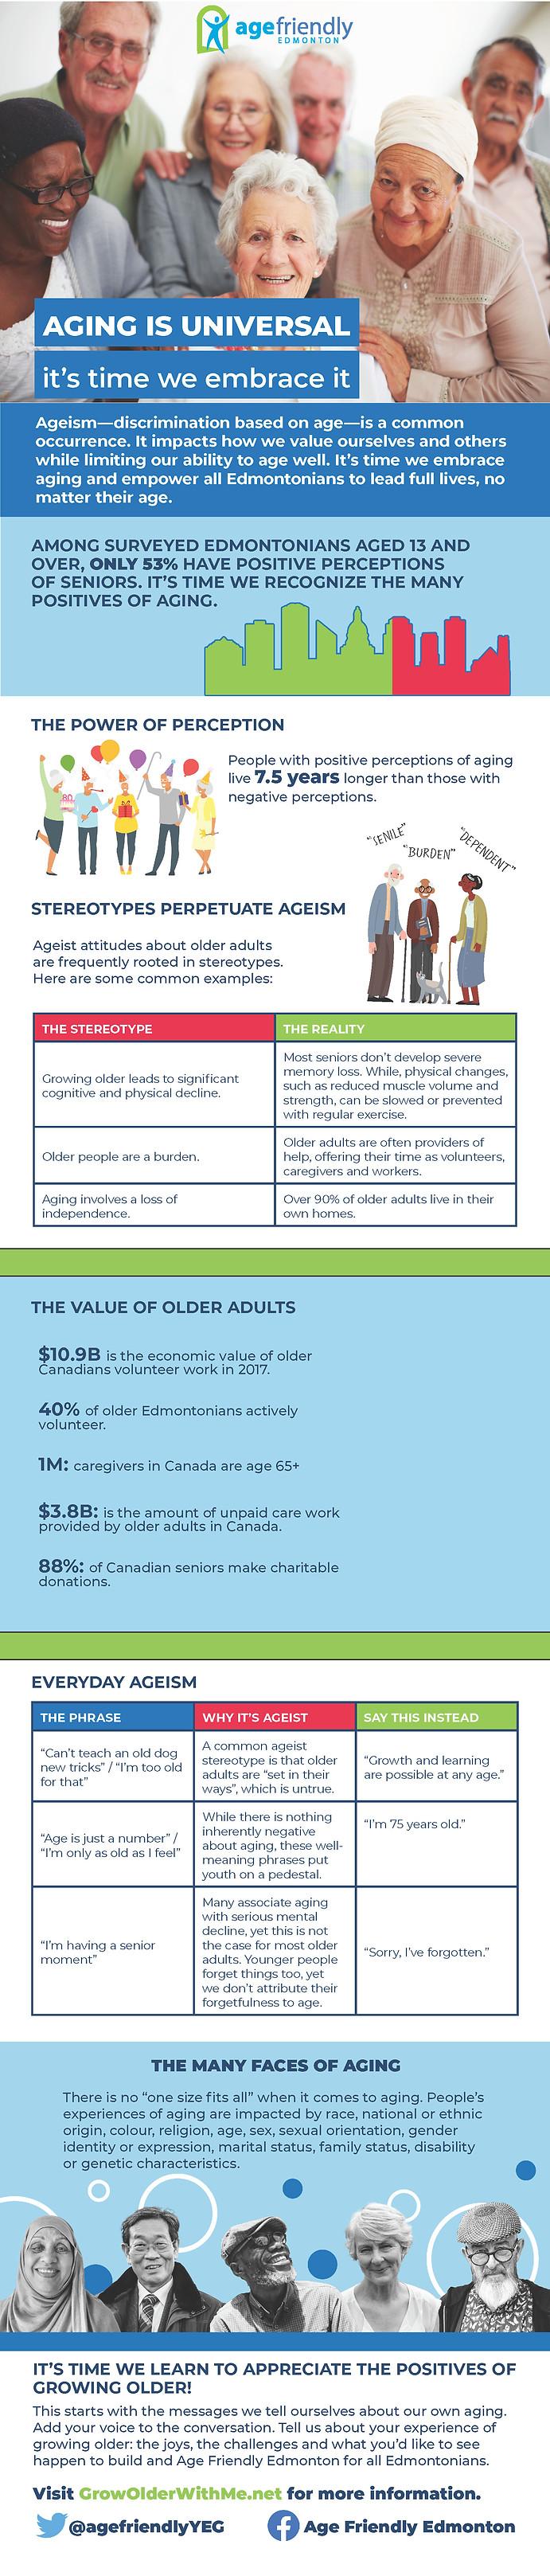 AFE-Infographic.jpg